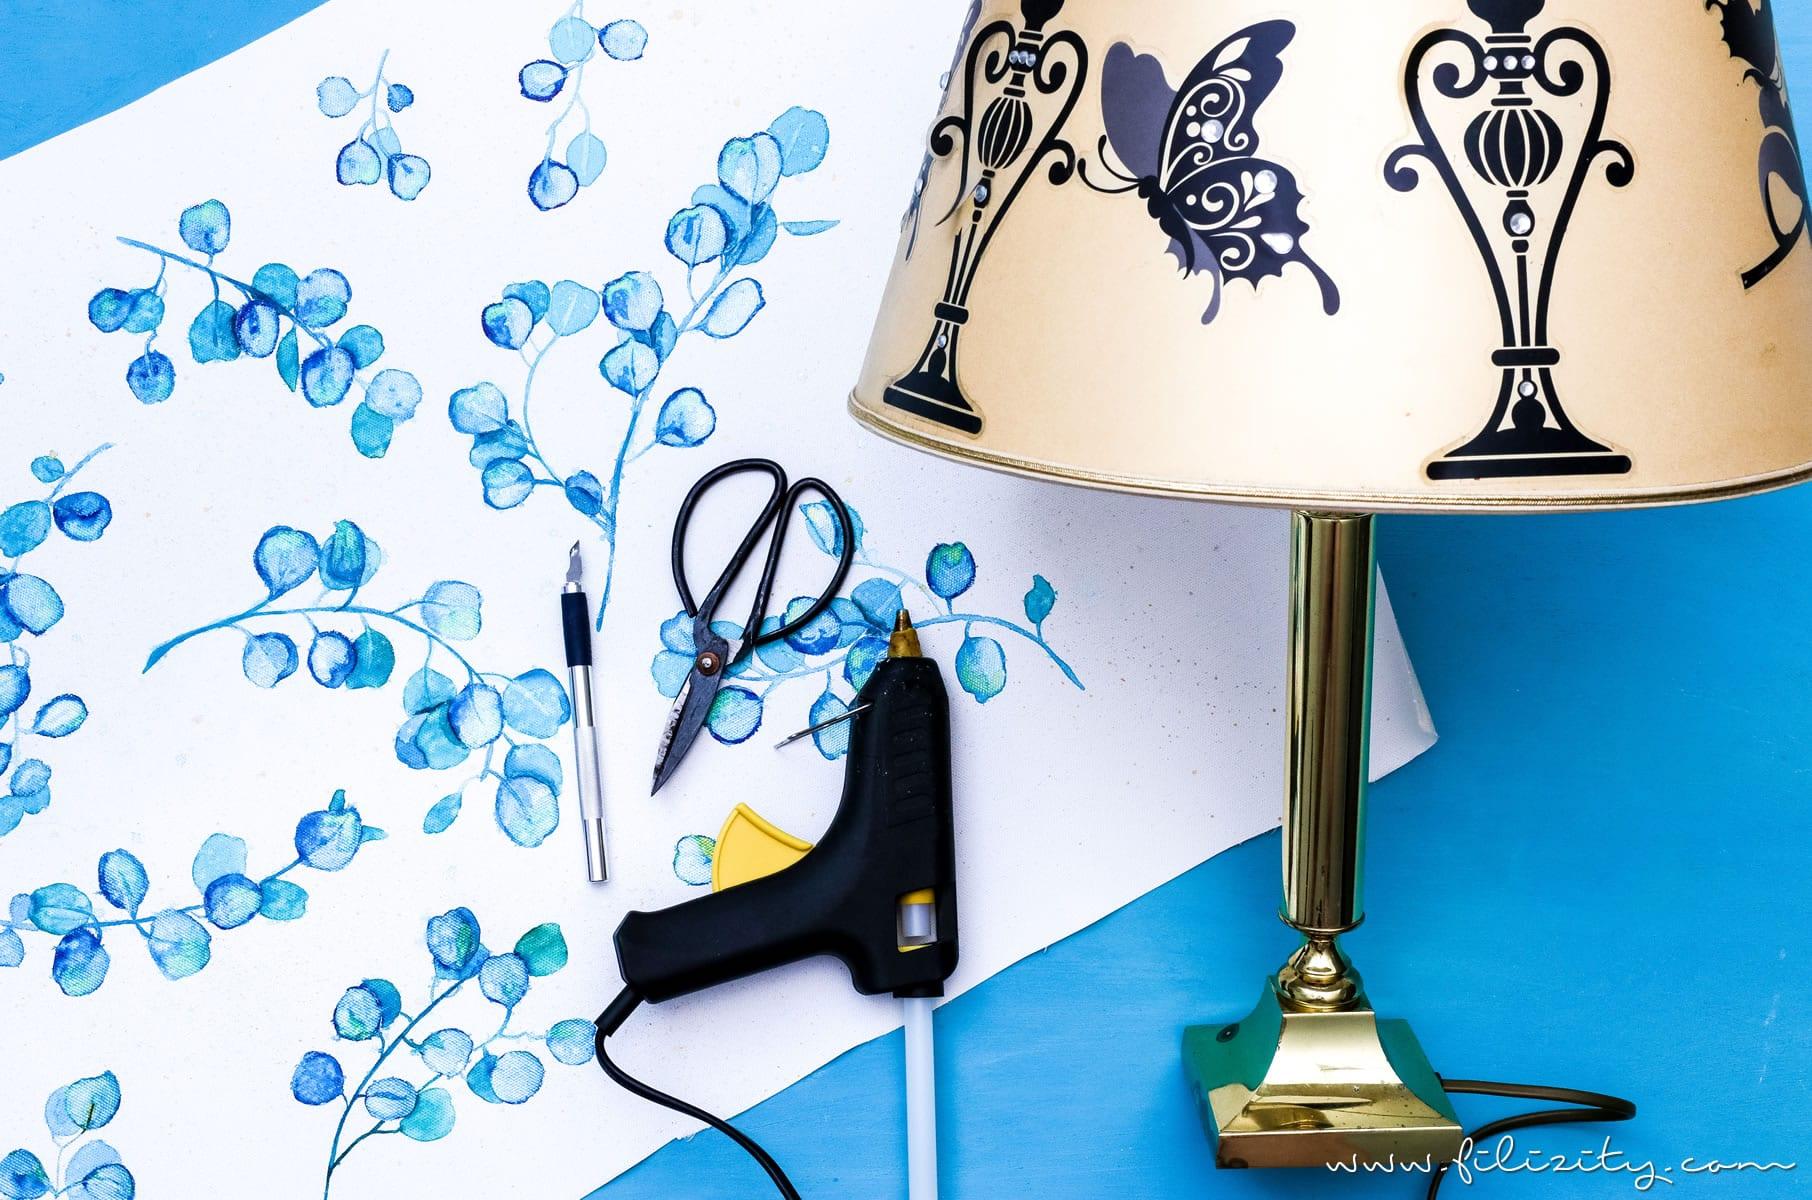 DIY Lampenschirm basteln aus Leinwand mit Aquarell-Muster | Upcycling Deko: Lampenschirm wechseln | Filizity.com | DIY-Blog aus dem Rheinland #upcycling #aquarell